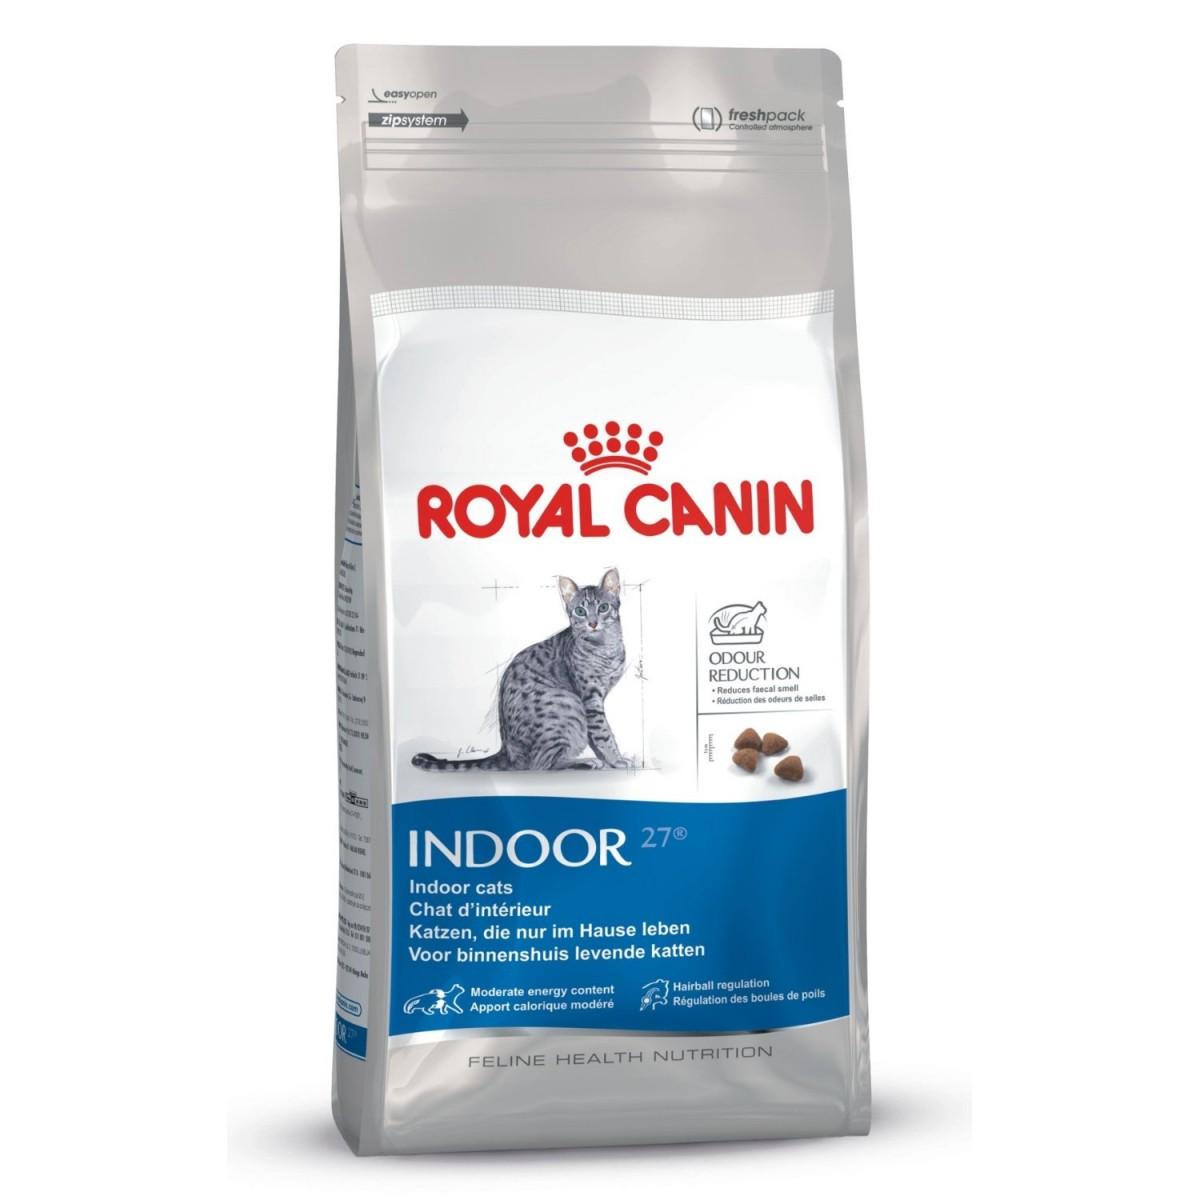 Royal Canin Indoor   2kg Katzenfutter für Hauskatzen